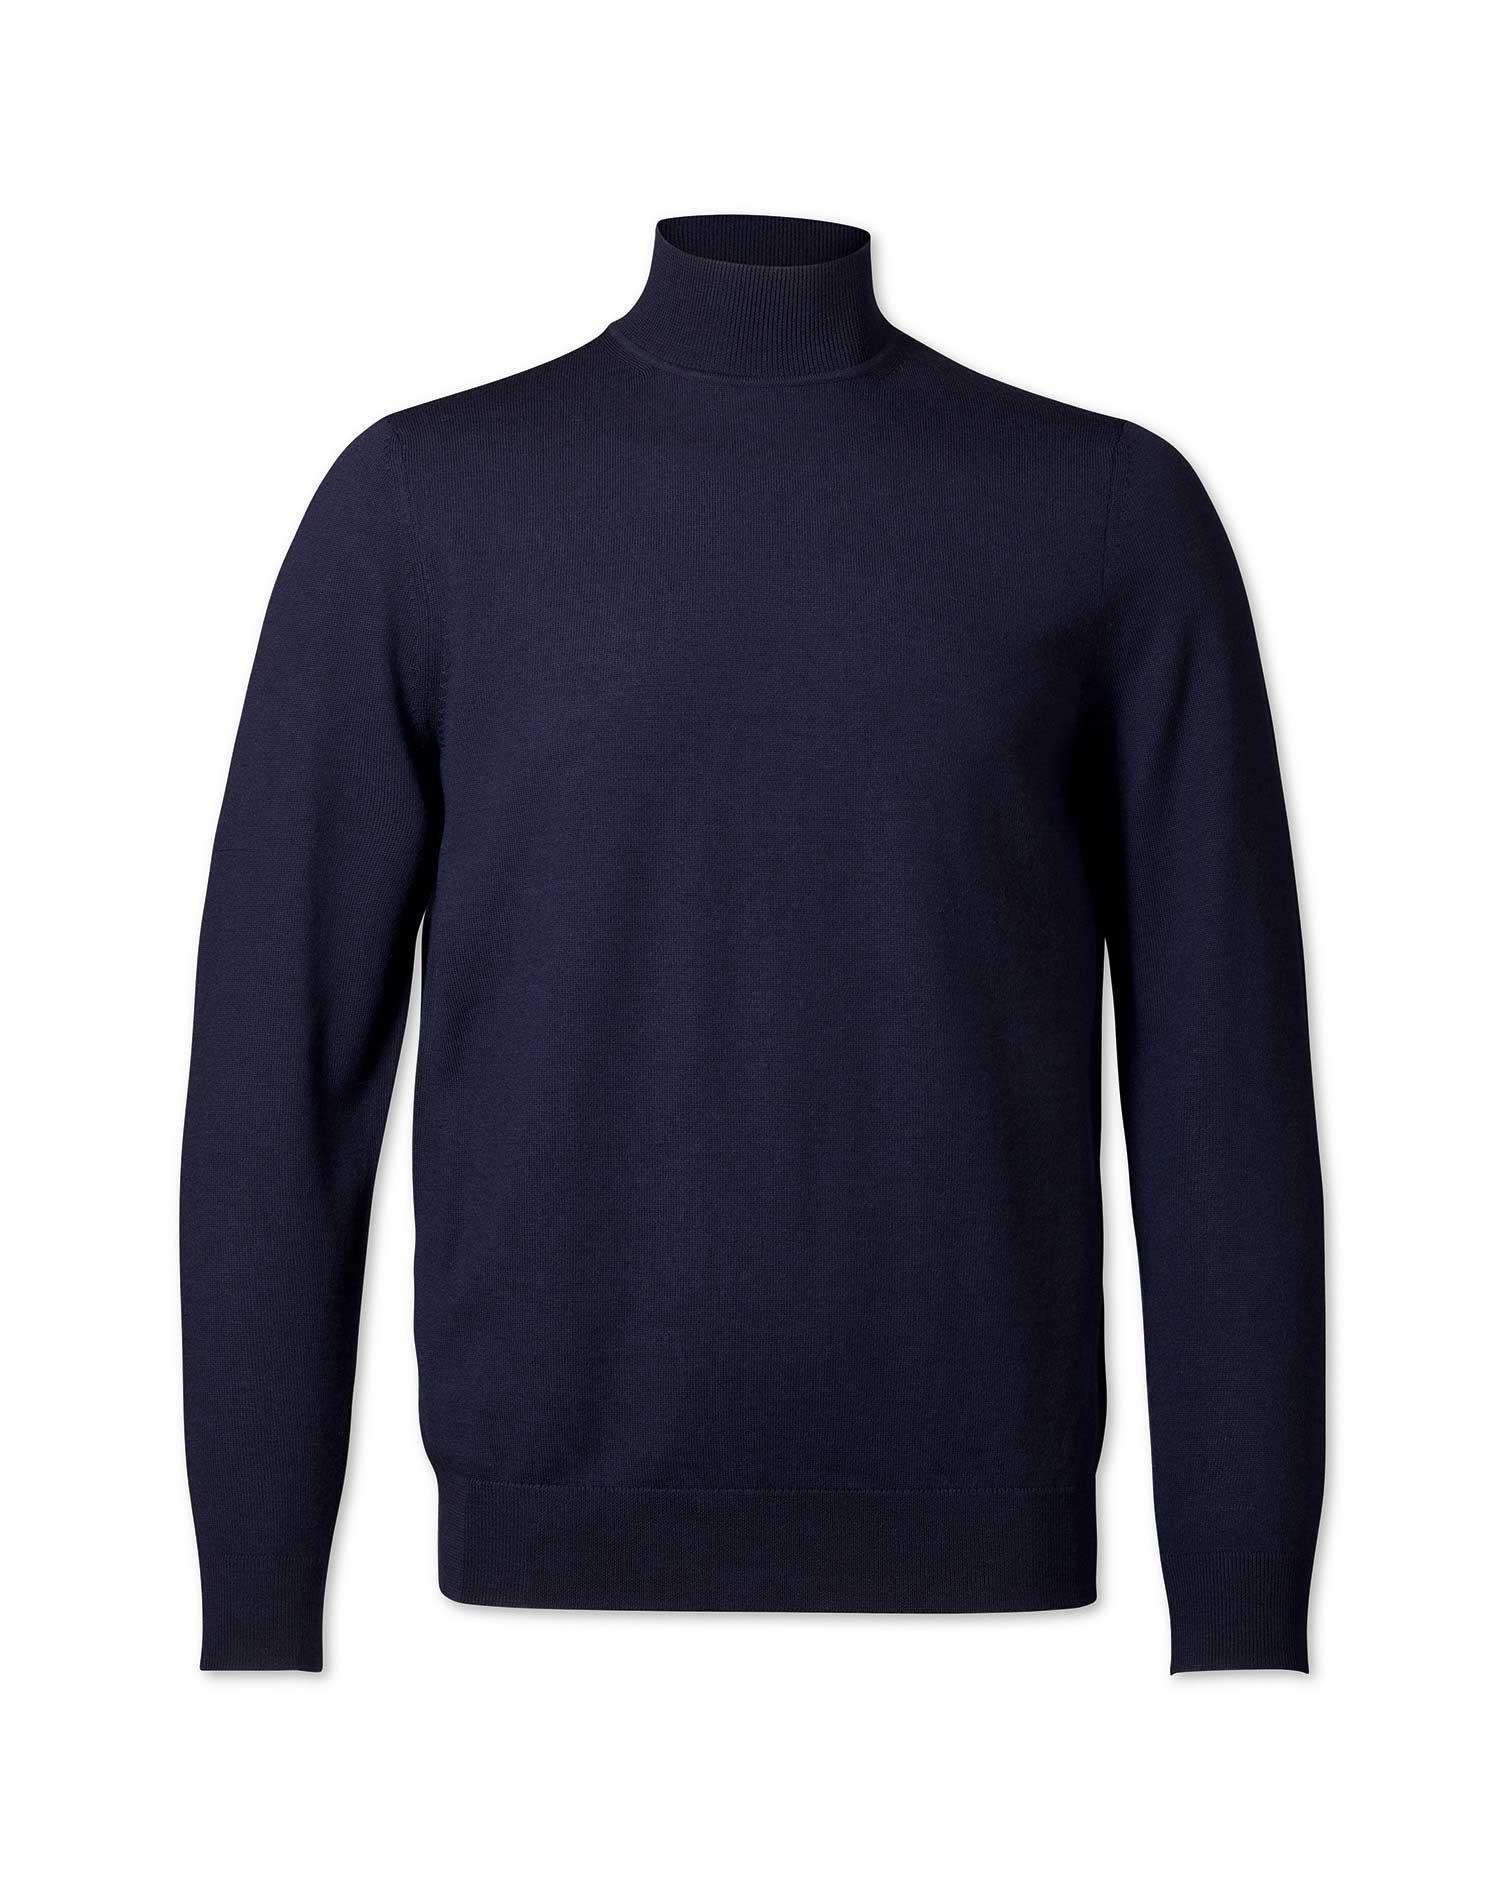 Navy Turtleneck Merino Wool Jumper Size Medium by Charles Tyrwhitt